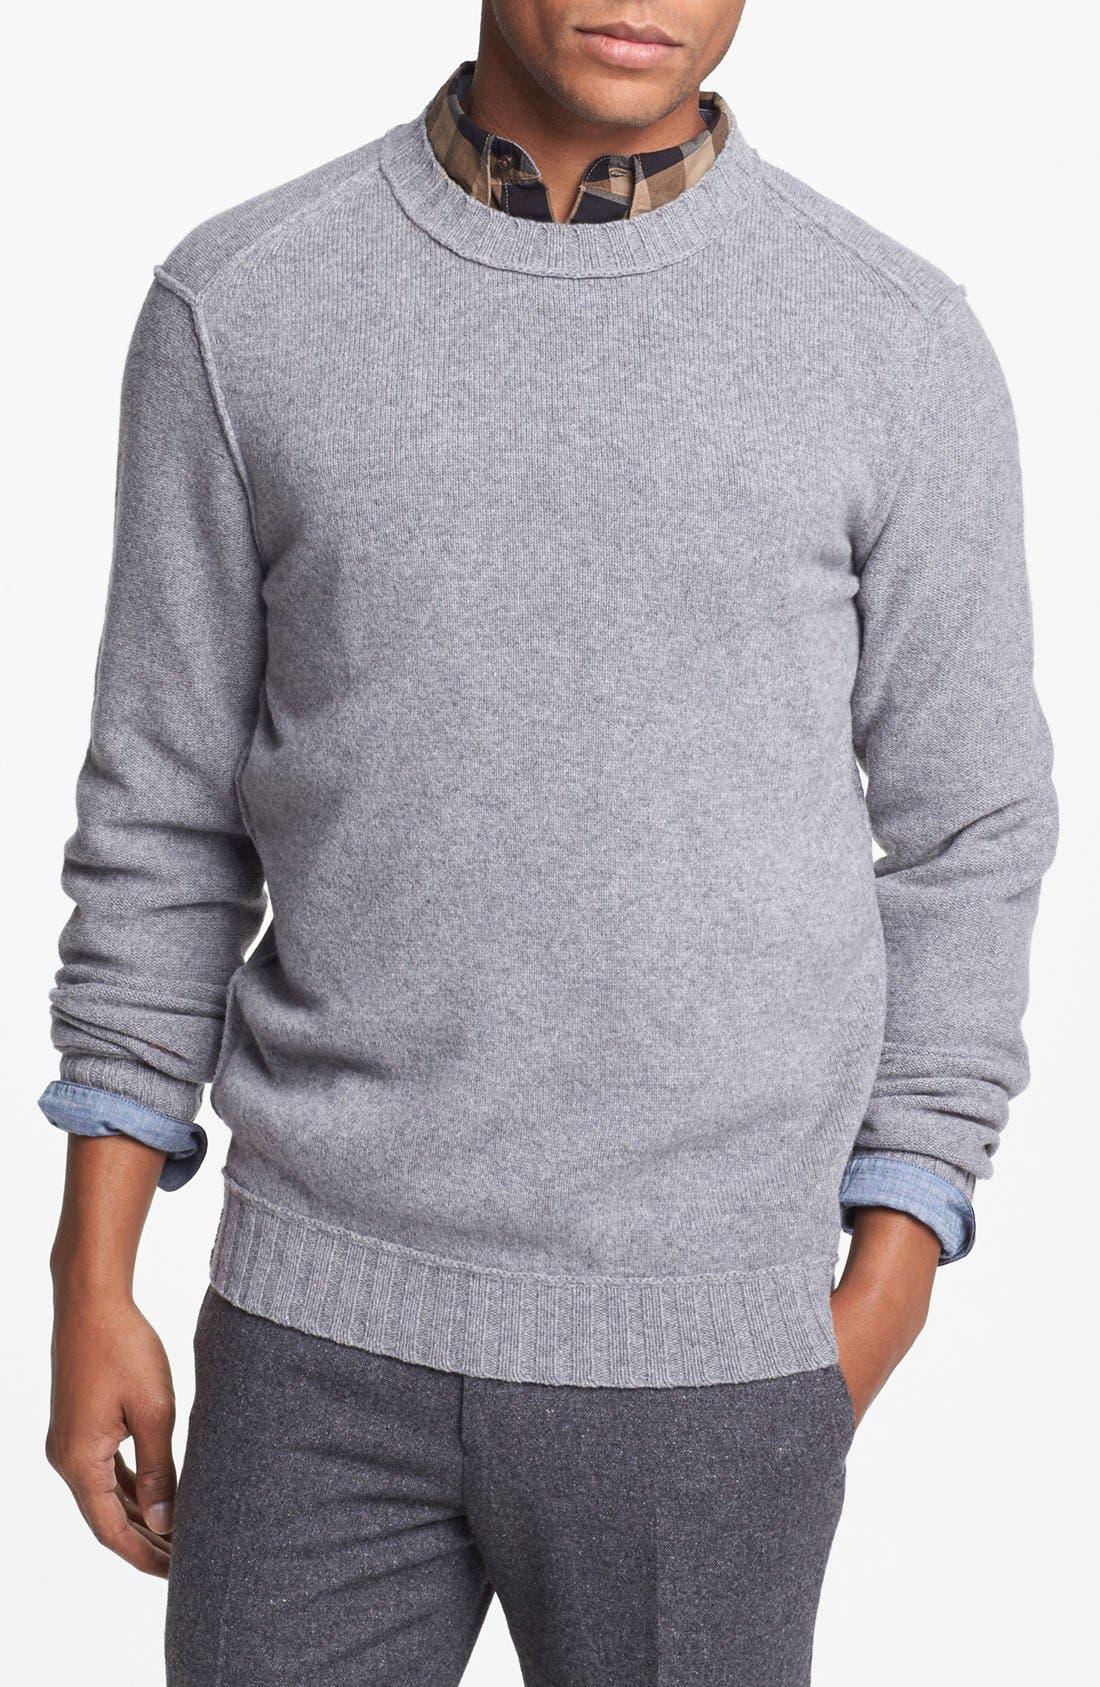 Main Image - BOSS Orange 'Adwin' Crewneck Sweater